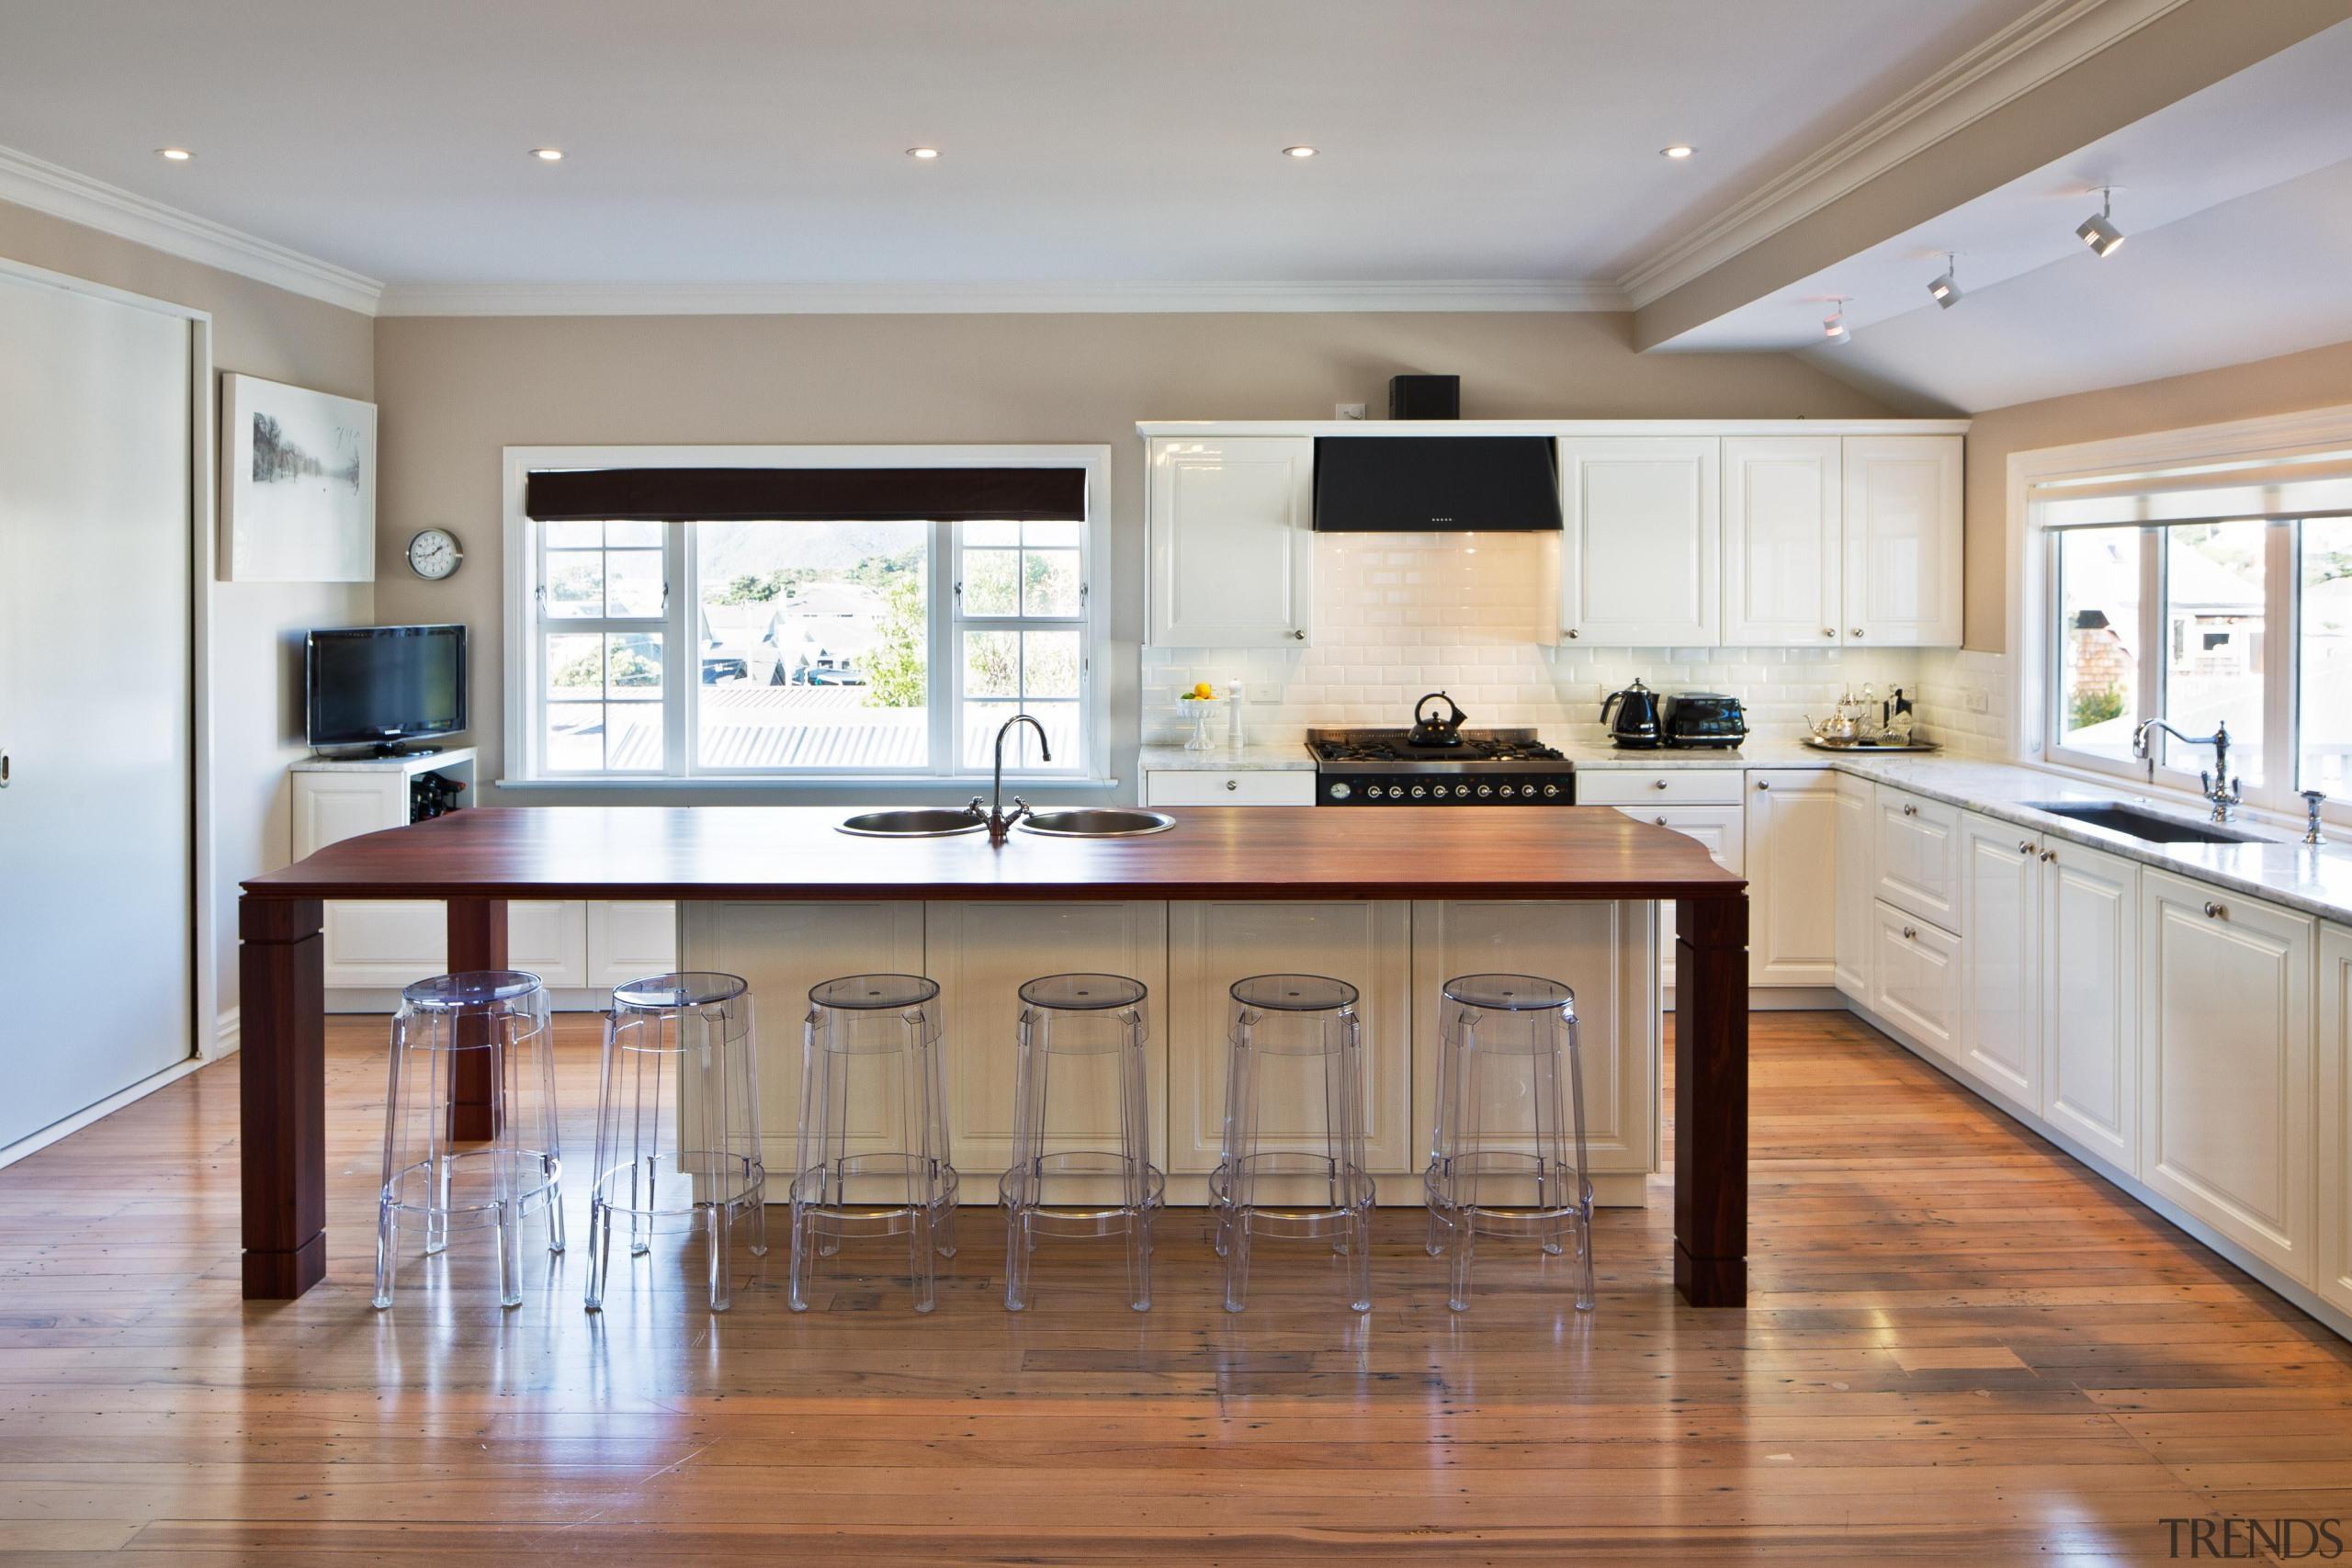 Wellington Kitchen of the Year 2013National Kitchen and cabinetry, countertop, cuisine classique, floor, flooring, hardwood, interior design, kitchen, laminate flooring, real estate, room, wood flooring, gray